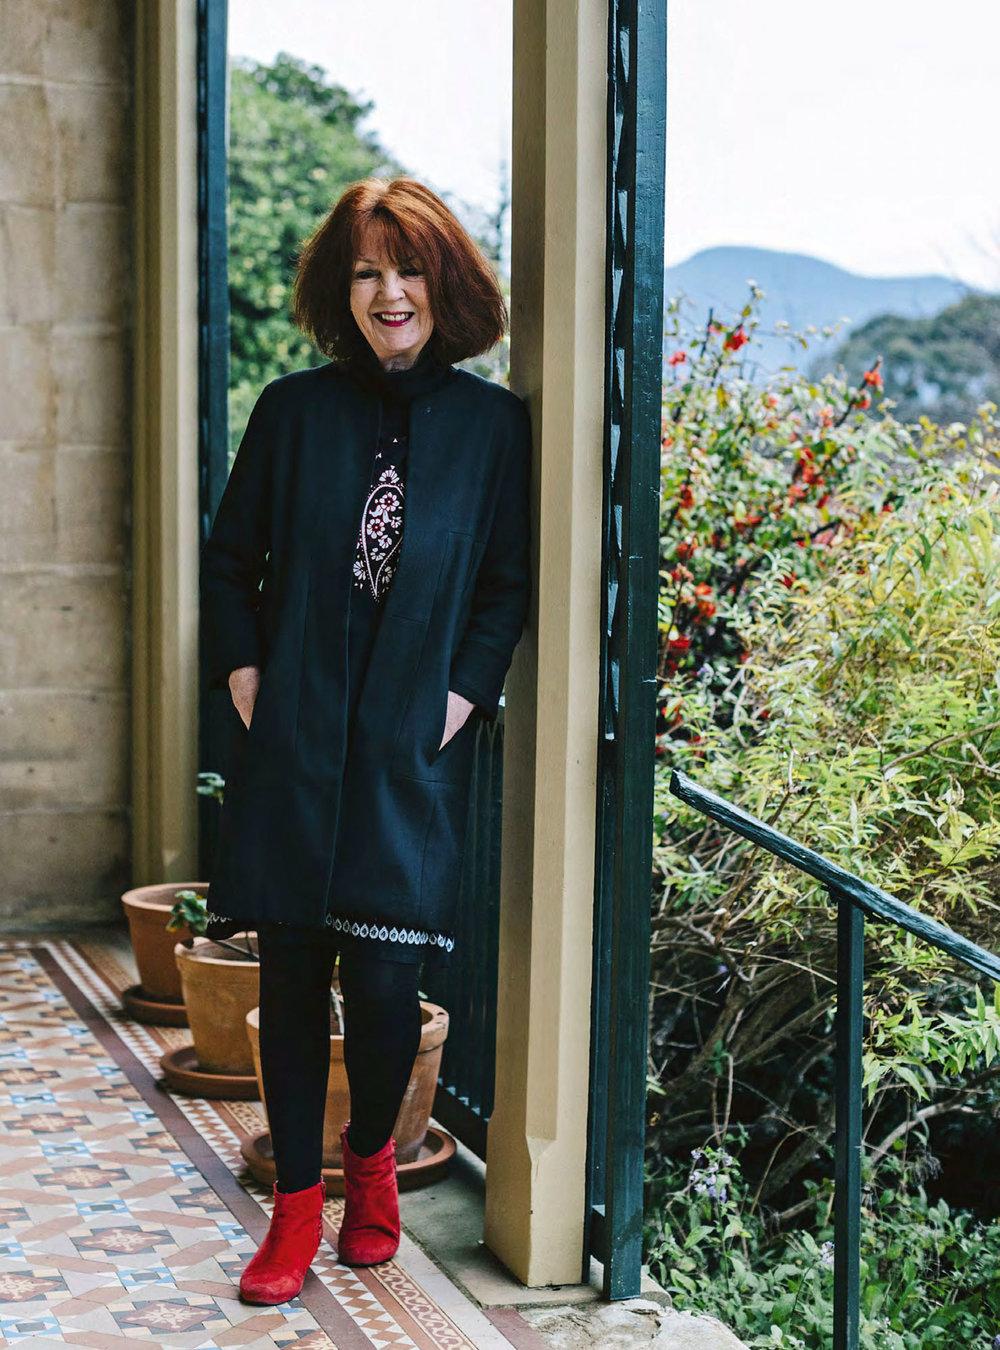 Marnie Hawson, Melbourne lifestyle photographer for Trust magazine, Issue 3 (Runnymede, Tasmania)